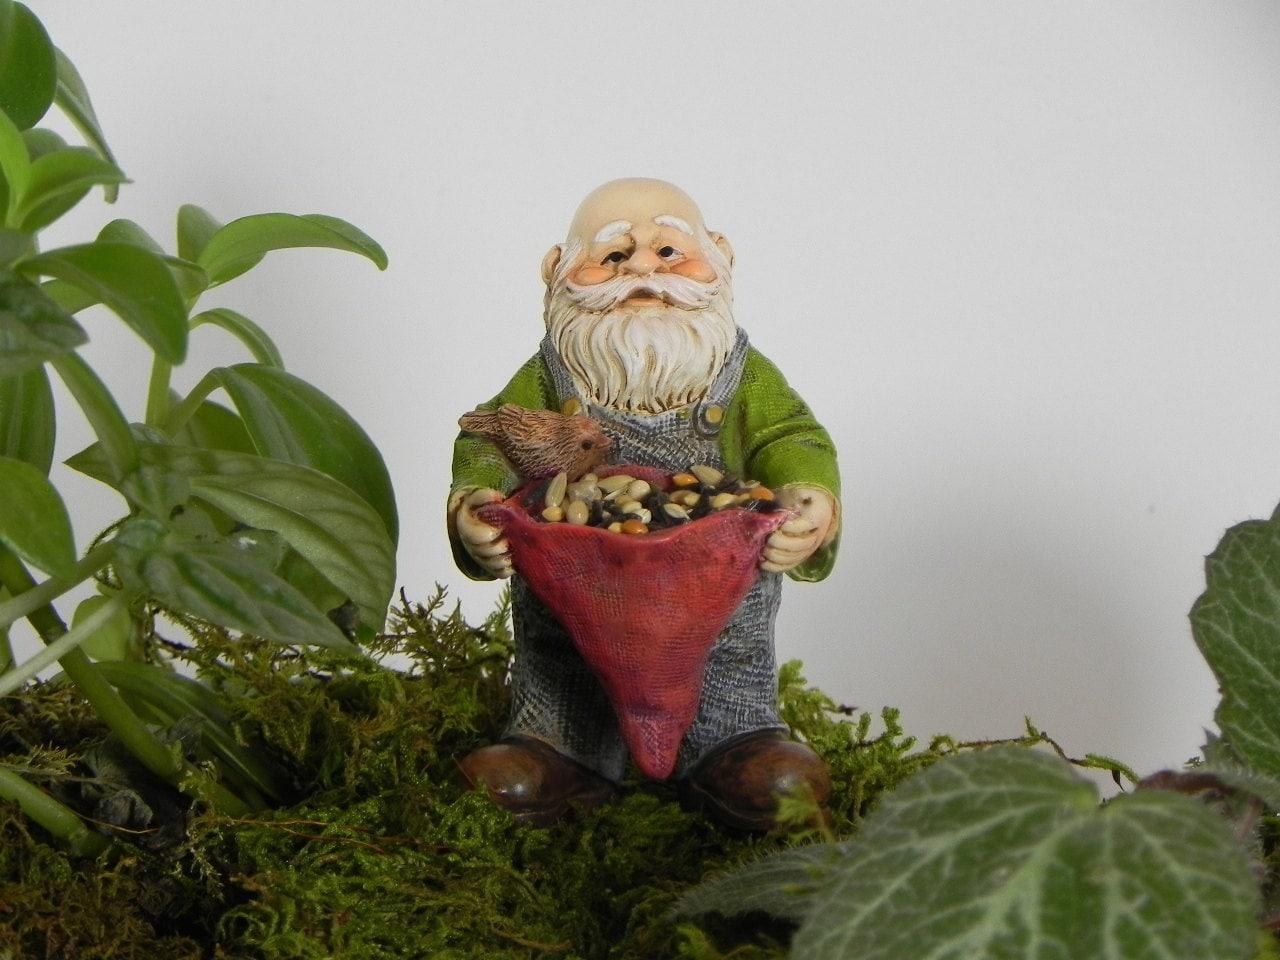 Gnome In Garden: Miniature Gnome Fairy Garden Accessories Bird Feeder Fairy